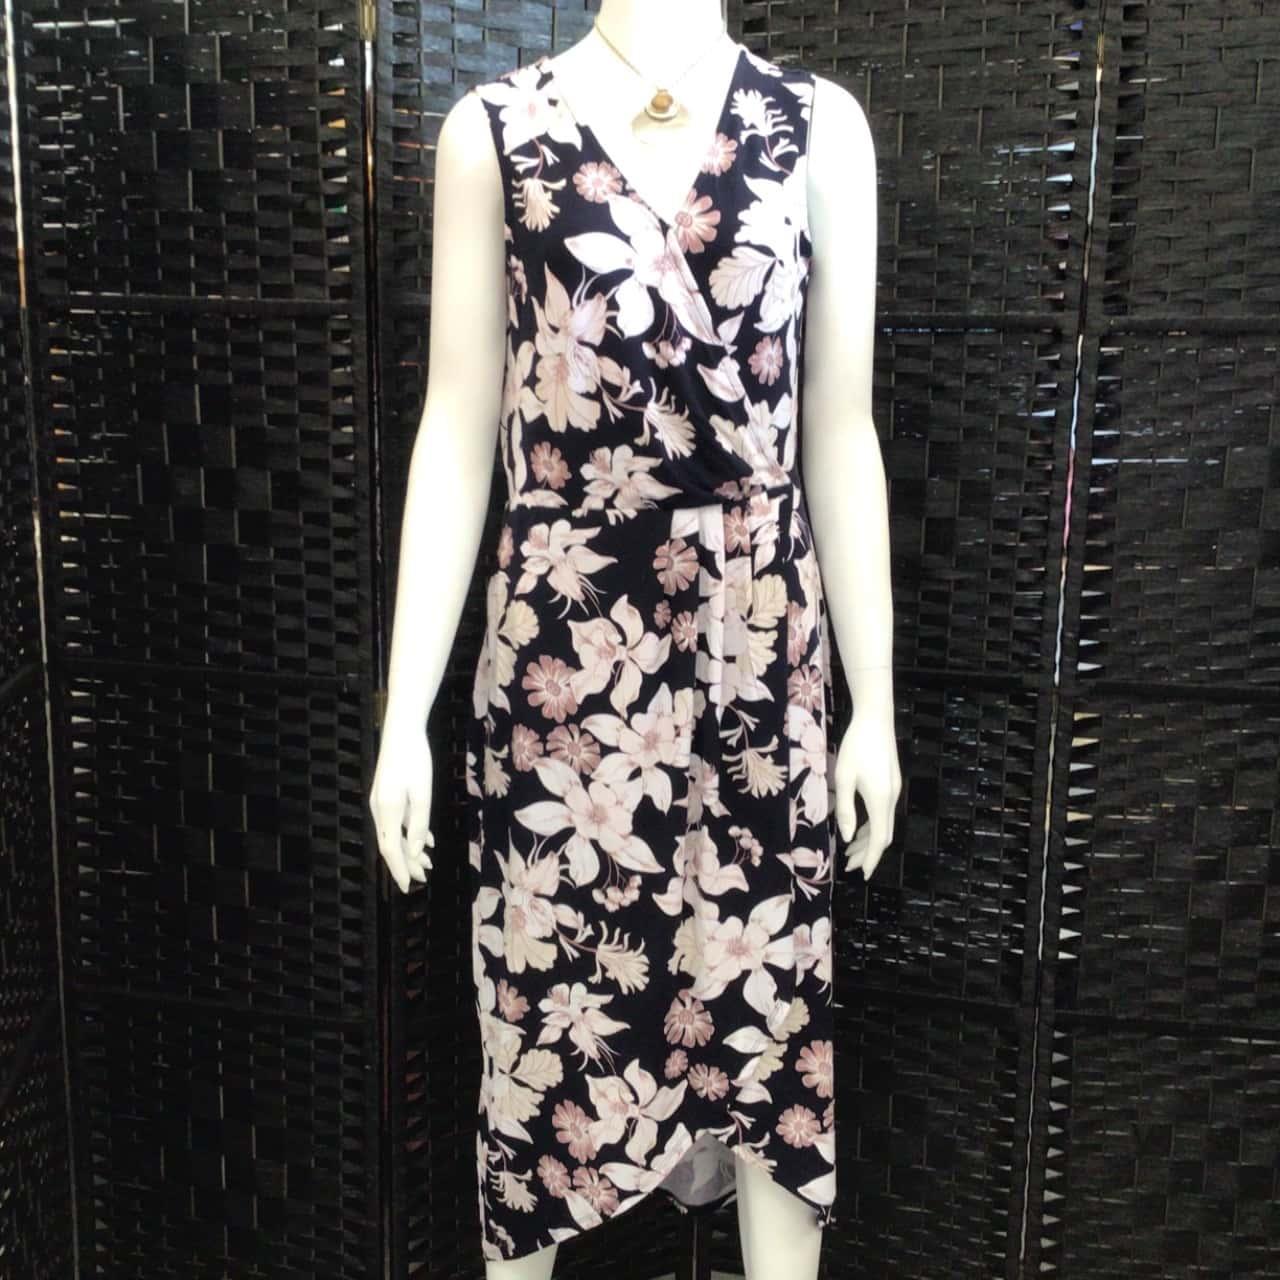 BNWT  Womens ROCKMANS Size 8 Maxi Dress Brown/Navy Blue/White RRP $69.99